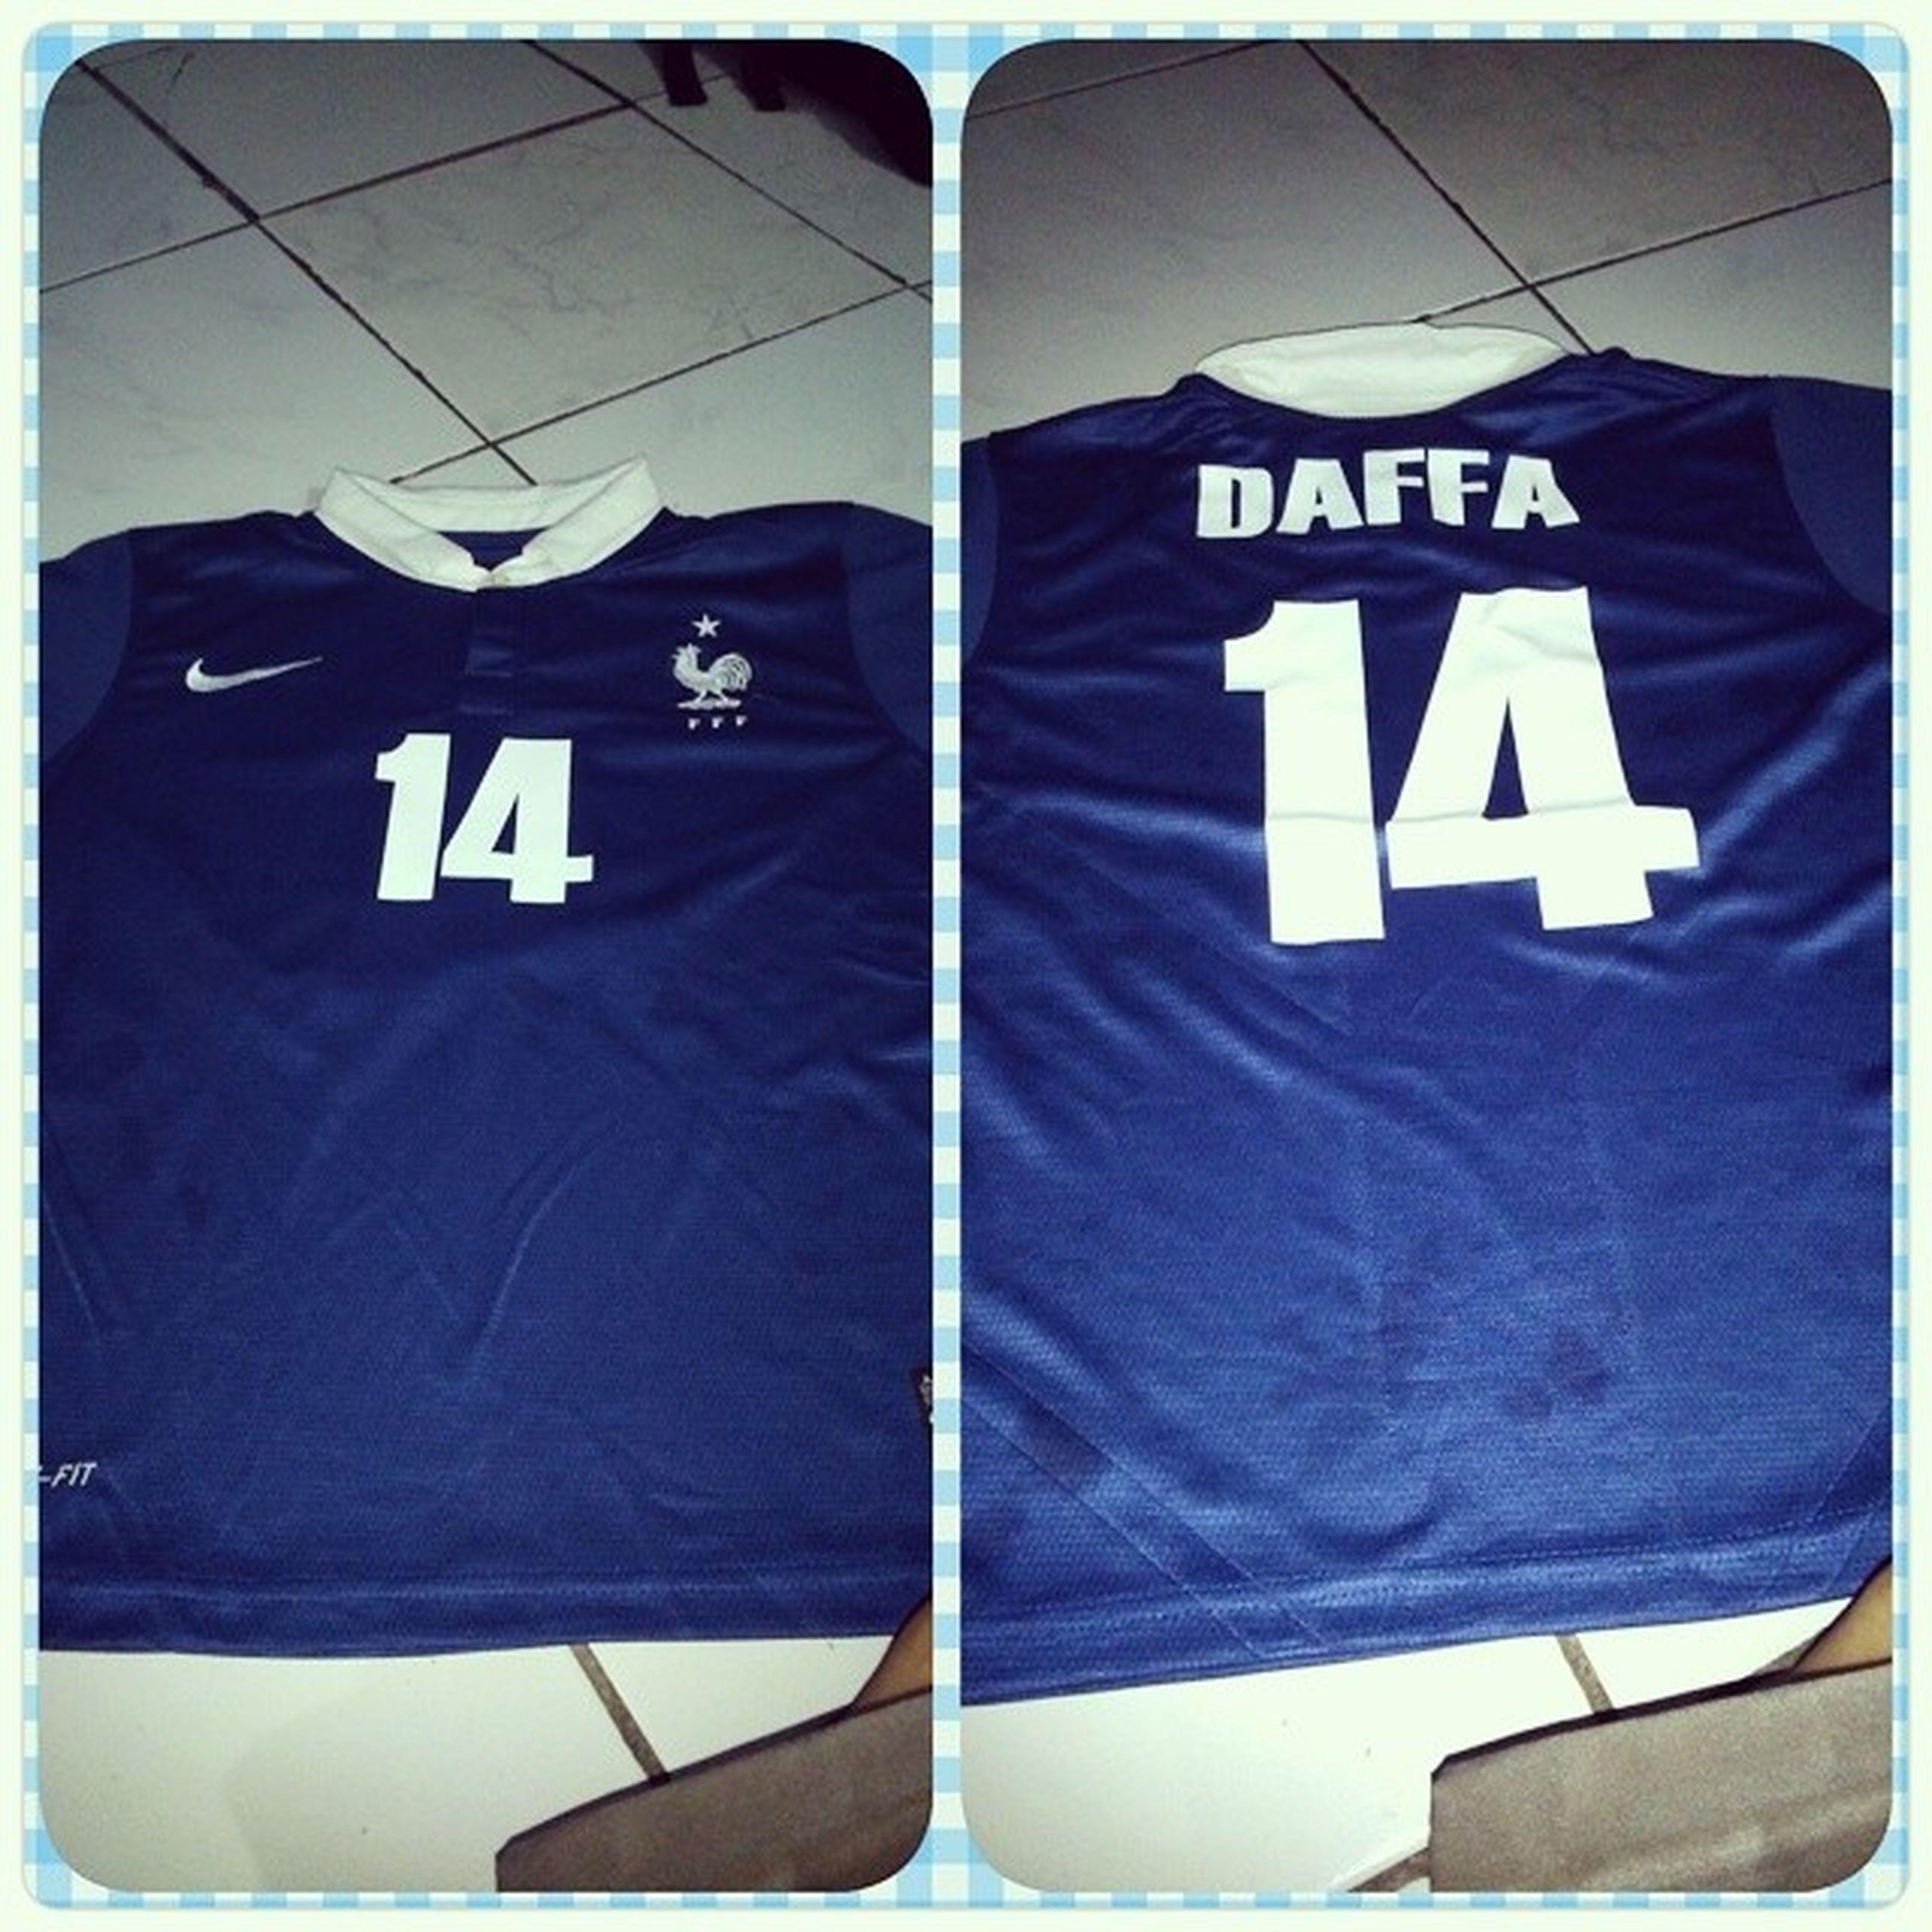 Happy birth day Daffa., wish you luck.,